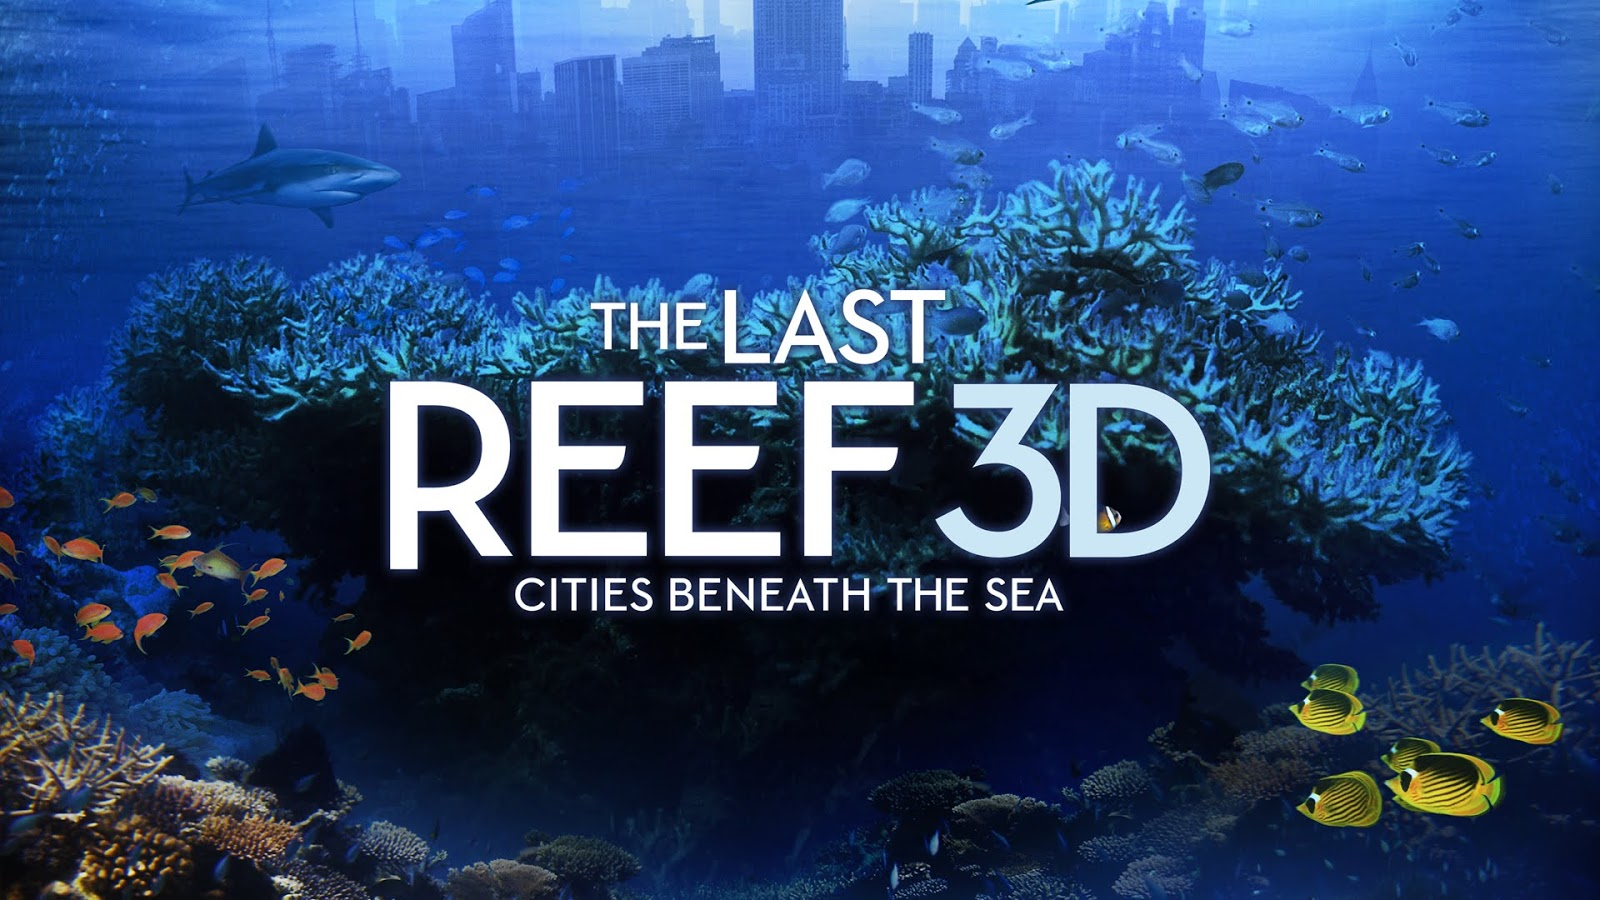 The Last Reef 3D (2012)